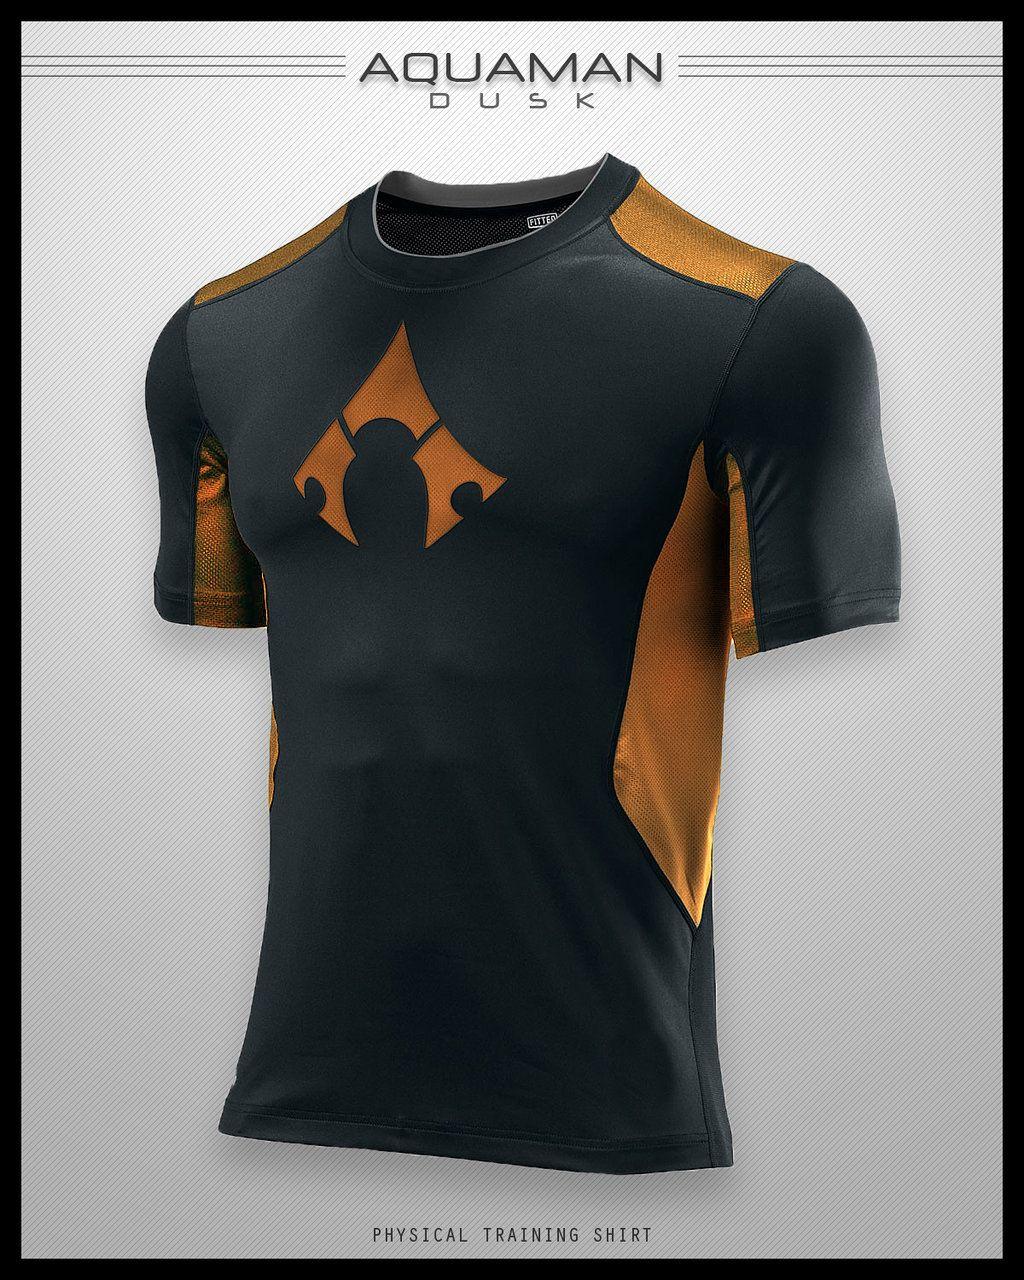 Aquaman Dusk Shirt by seventhirtytwo on deviantART CONCEPT